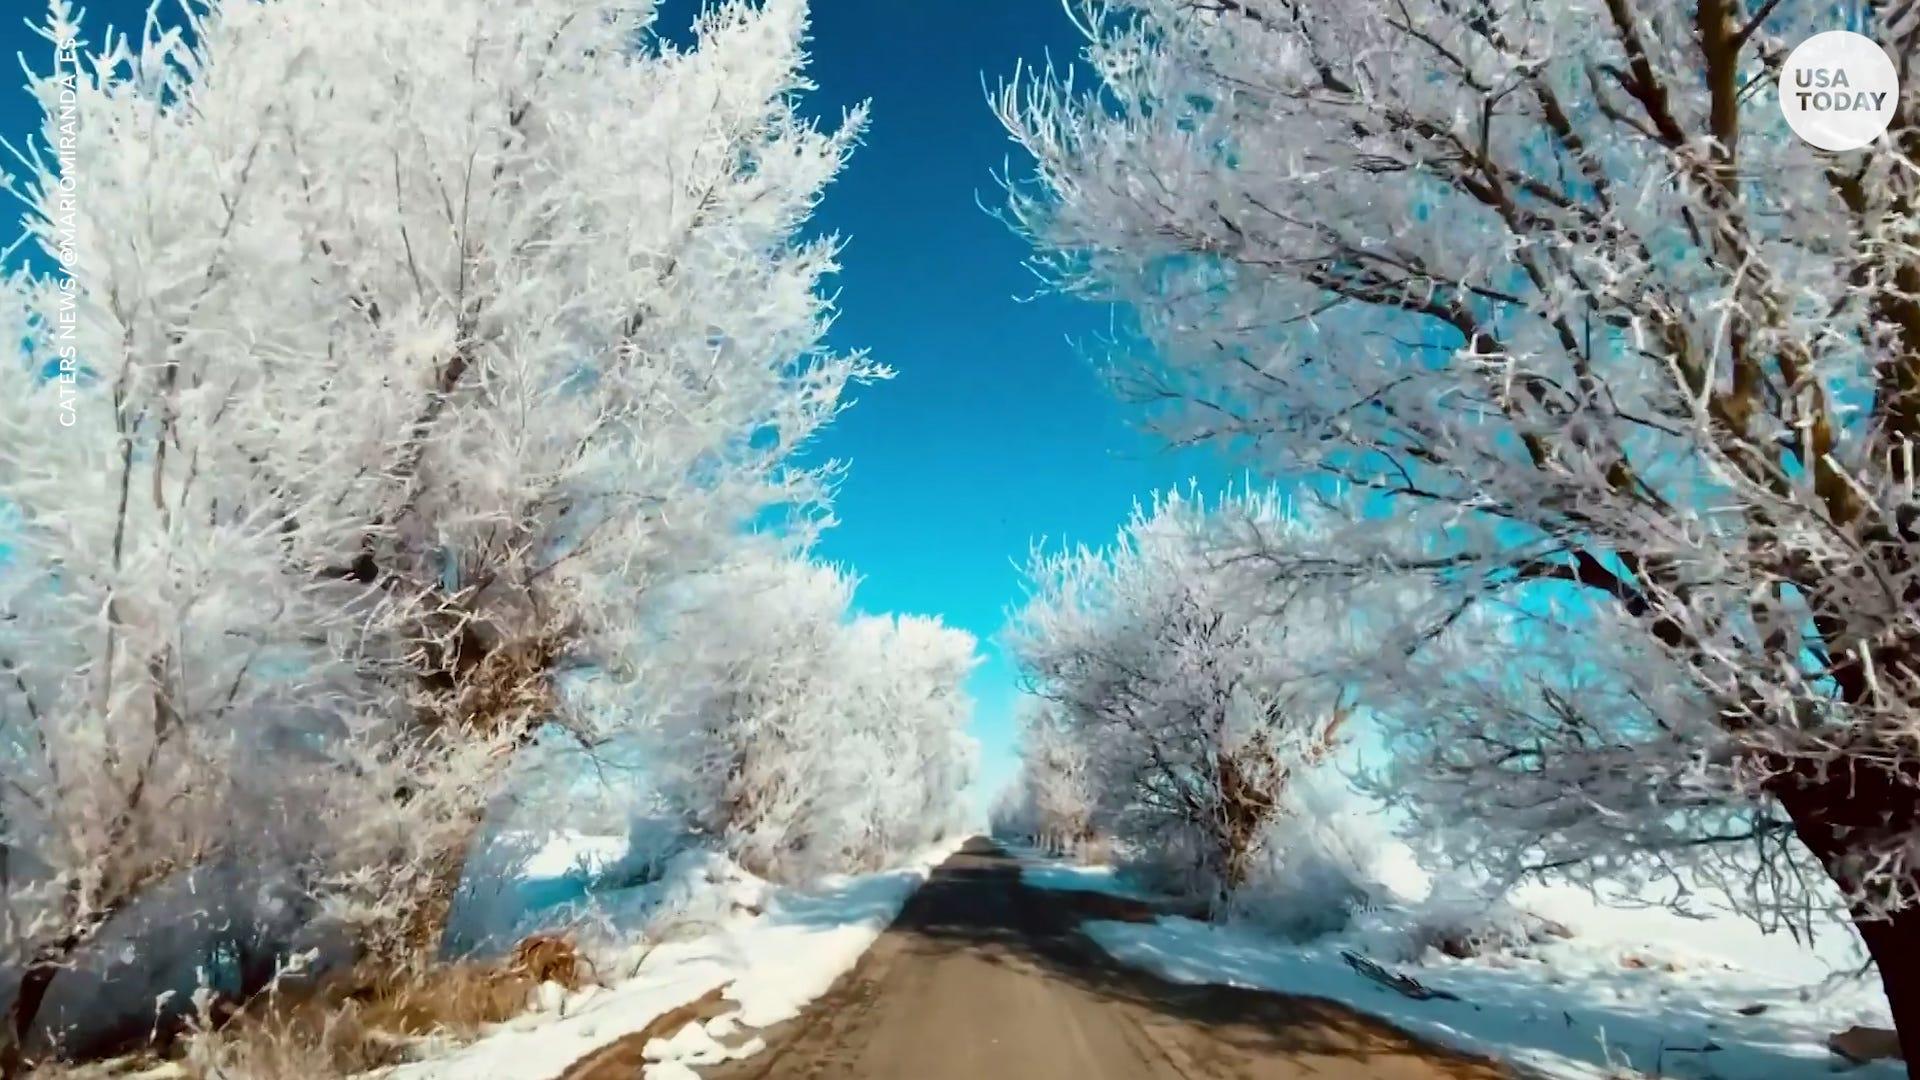 Snow and ice create beautiful winter wonderland in Spain